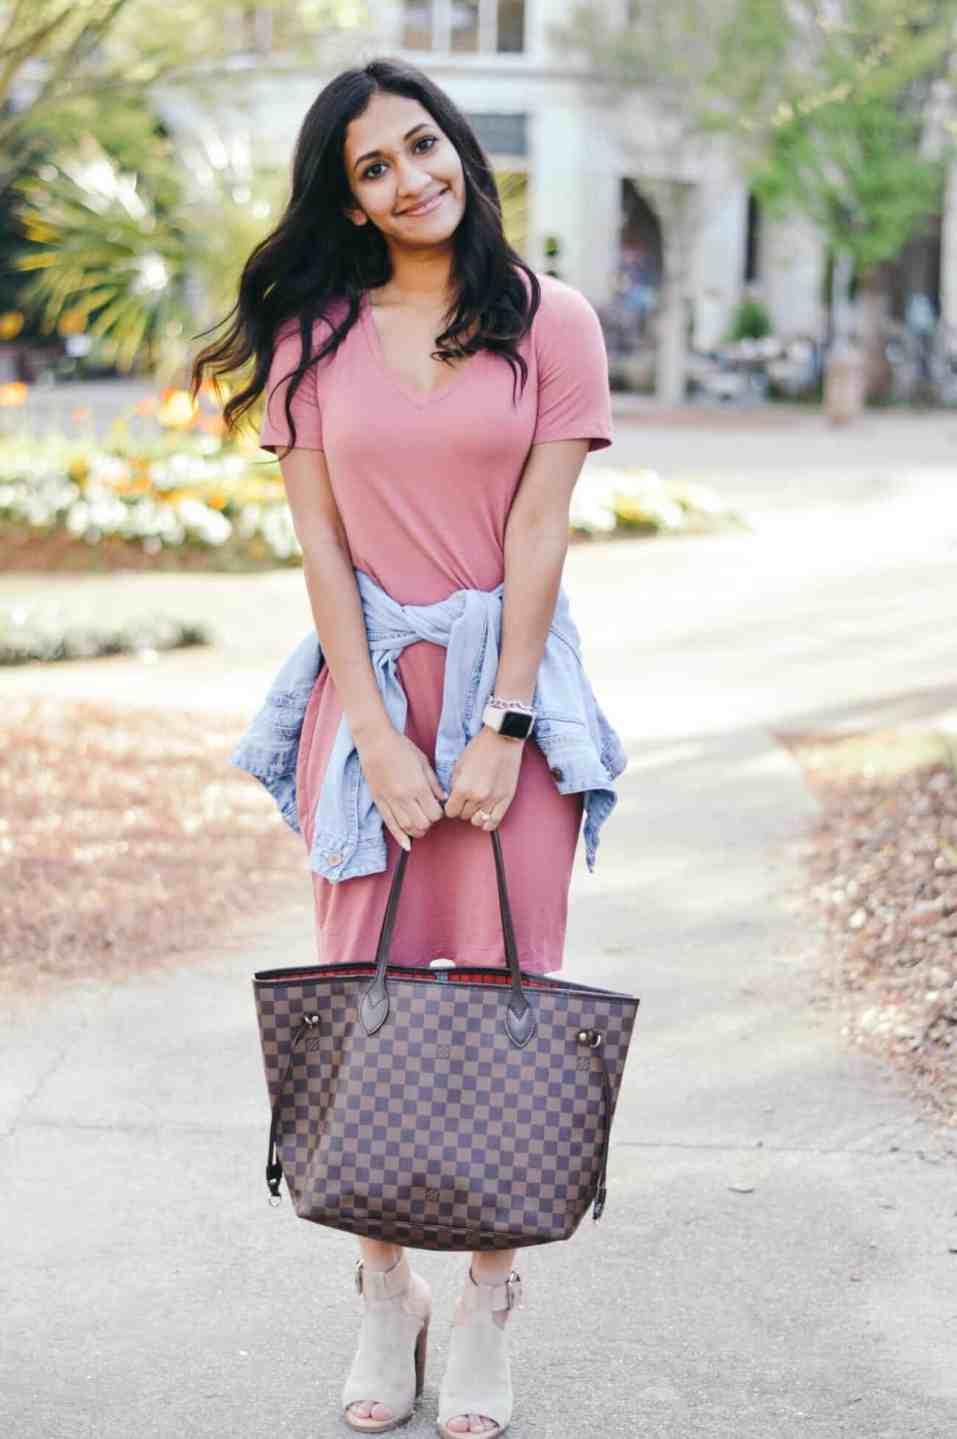 Amazon Spring Clothing Essentials Under $50